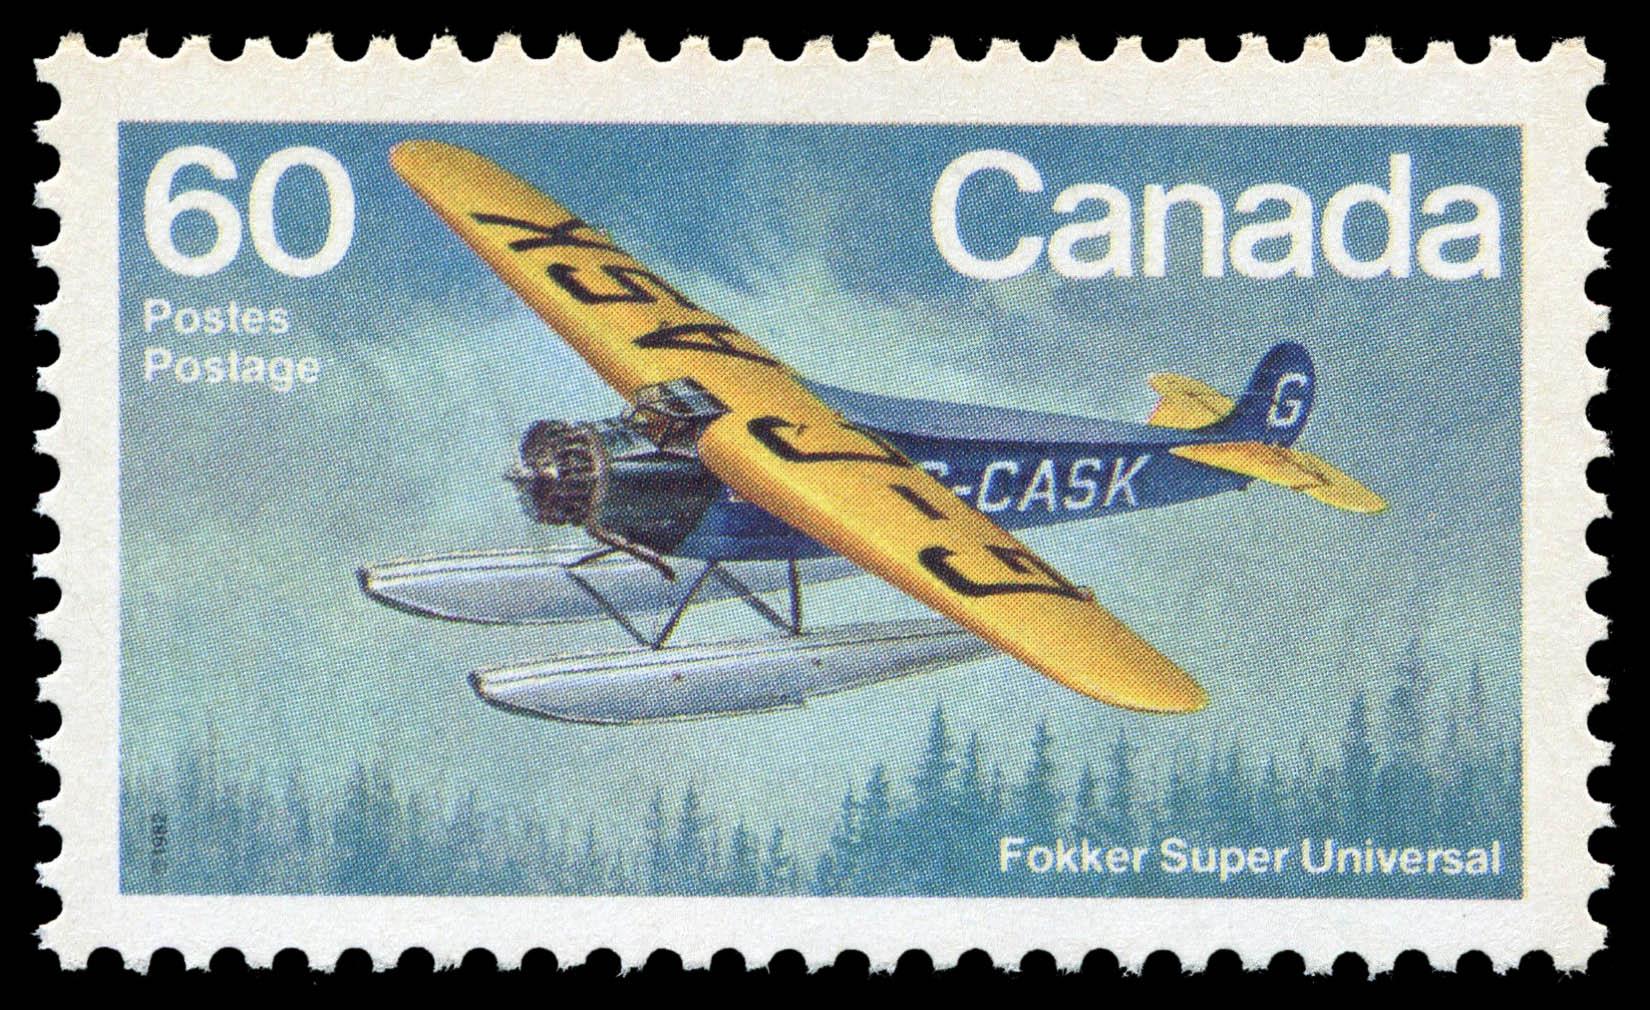 Fokker Super Universal Canada Postage Stamp